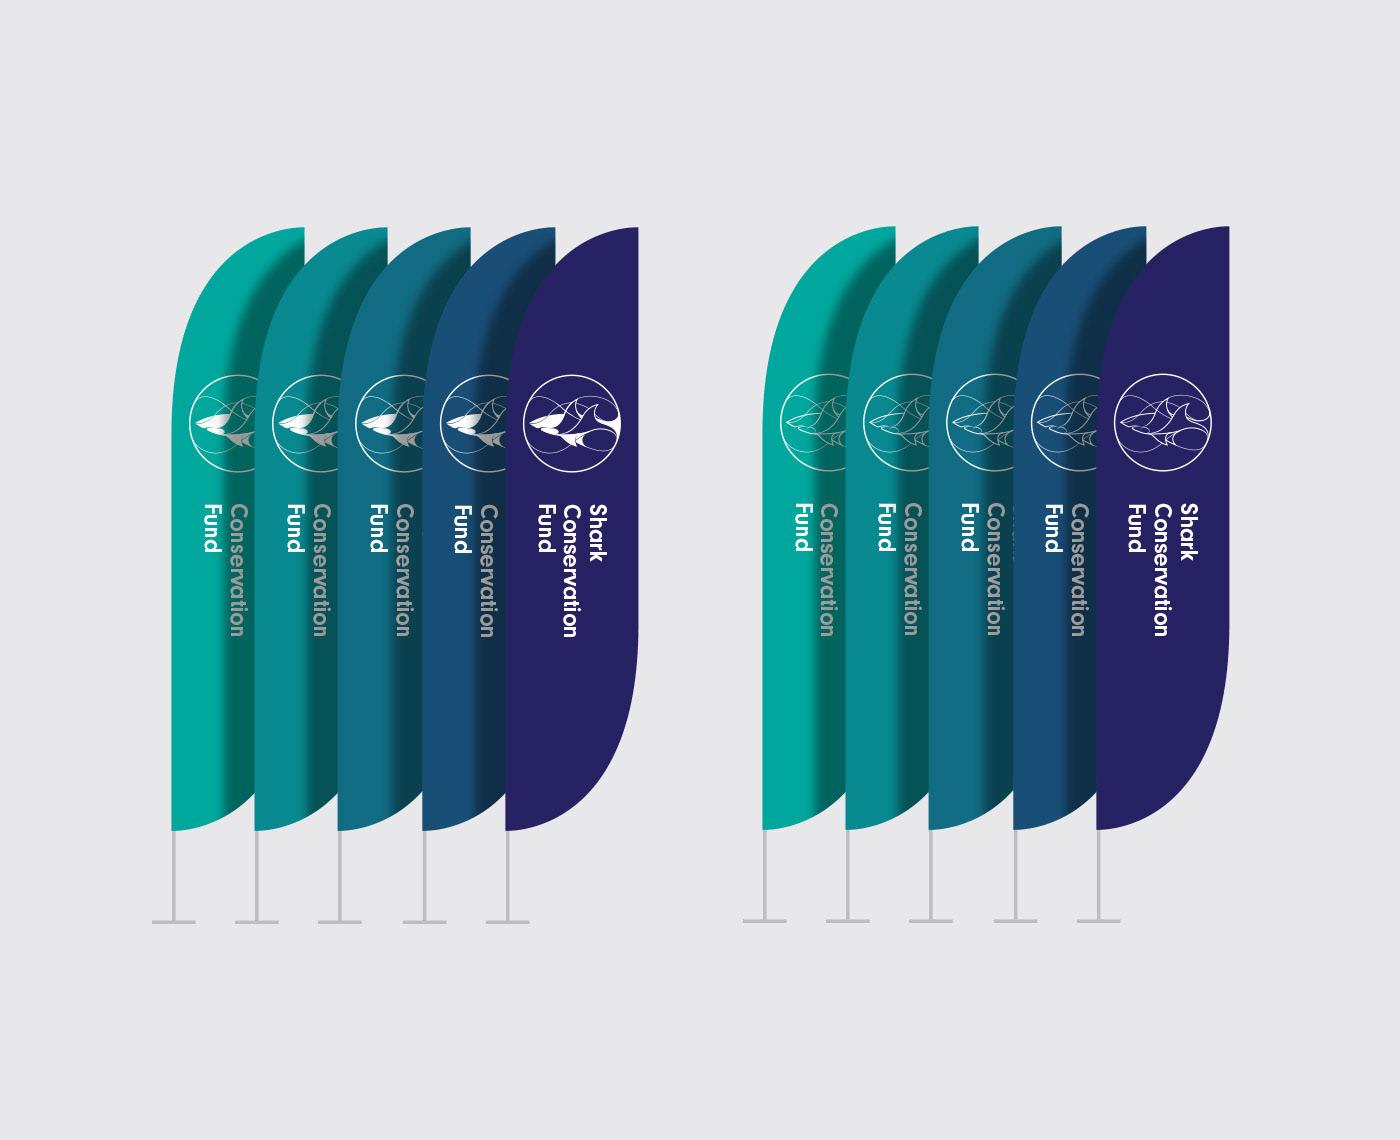 superfried leonardo dicaprio foundation logo brand identity sharks rays ILLUSTRATION  graphic design  shark conservation fund charity